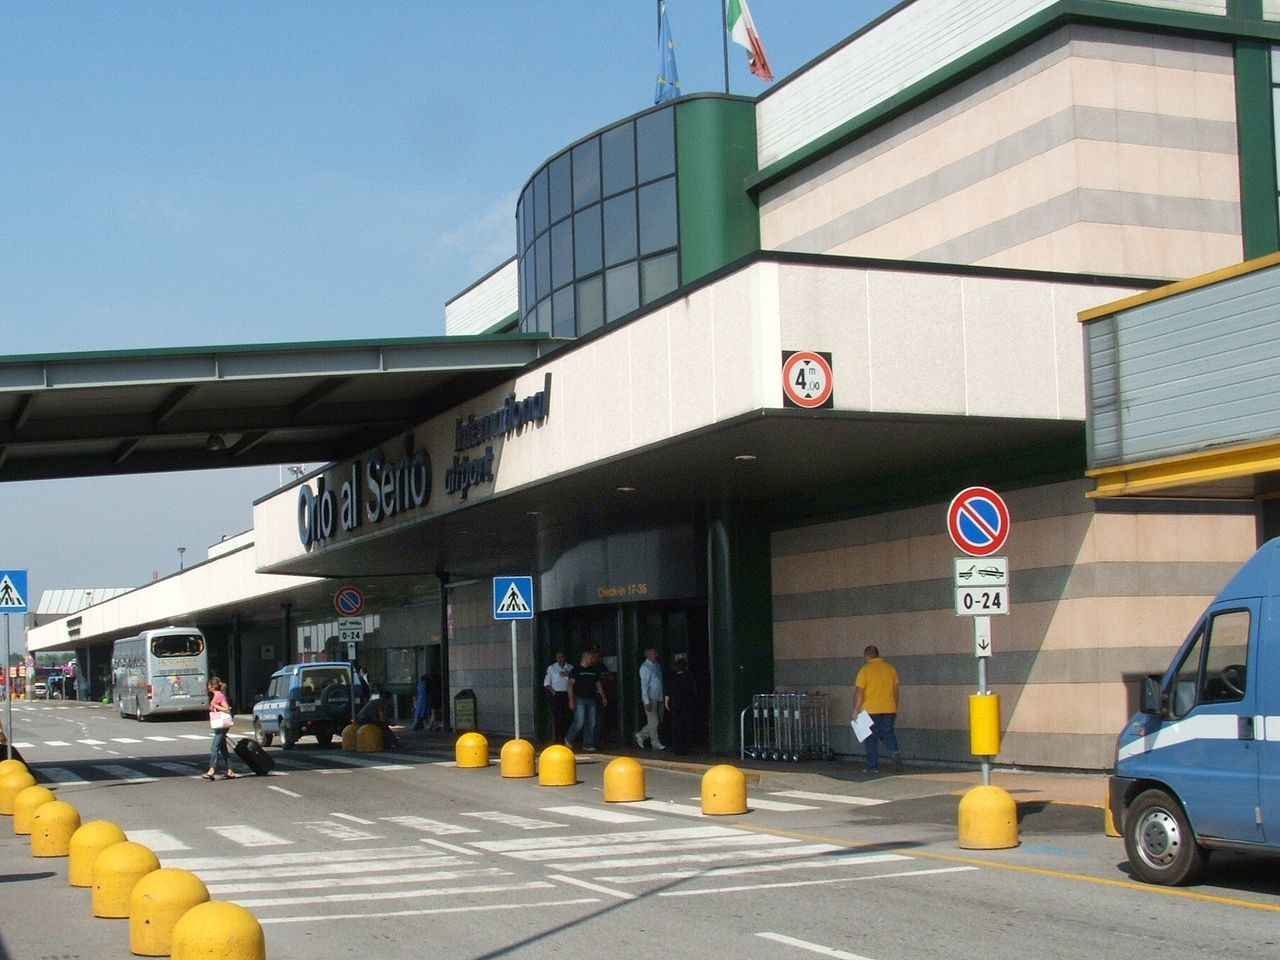 9. Sân bay quốc tế Berlin Tegel,Đức